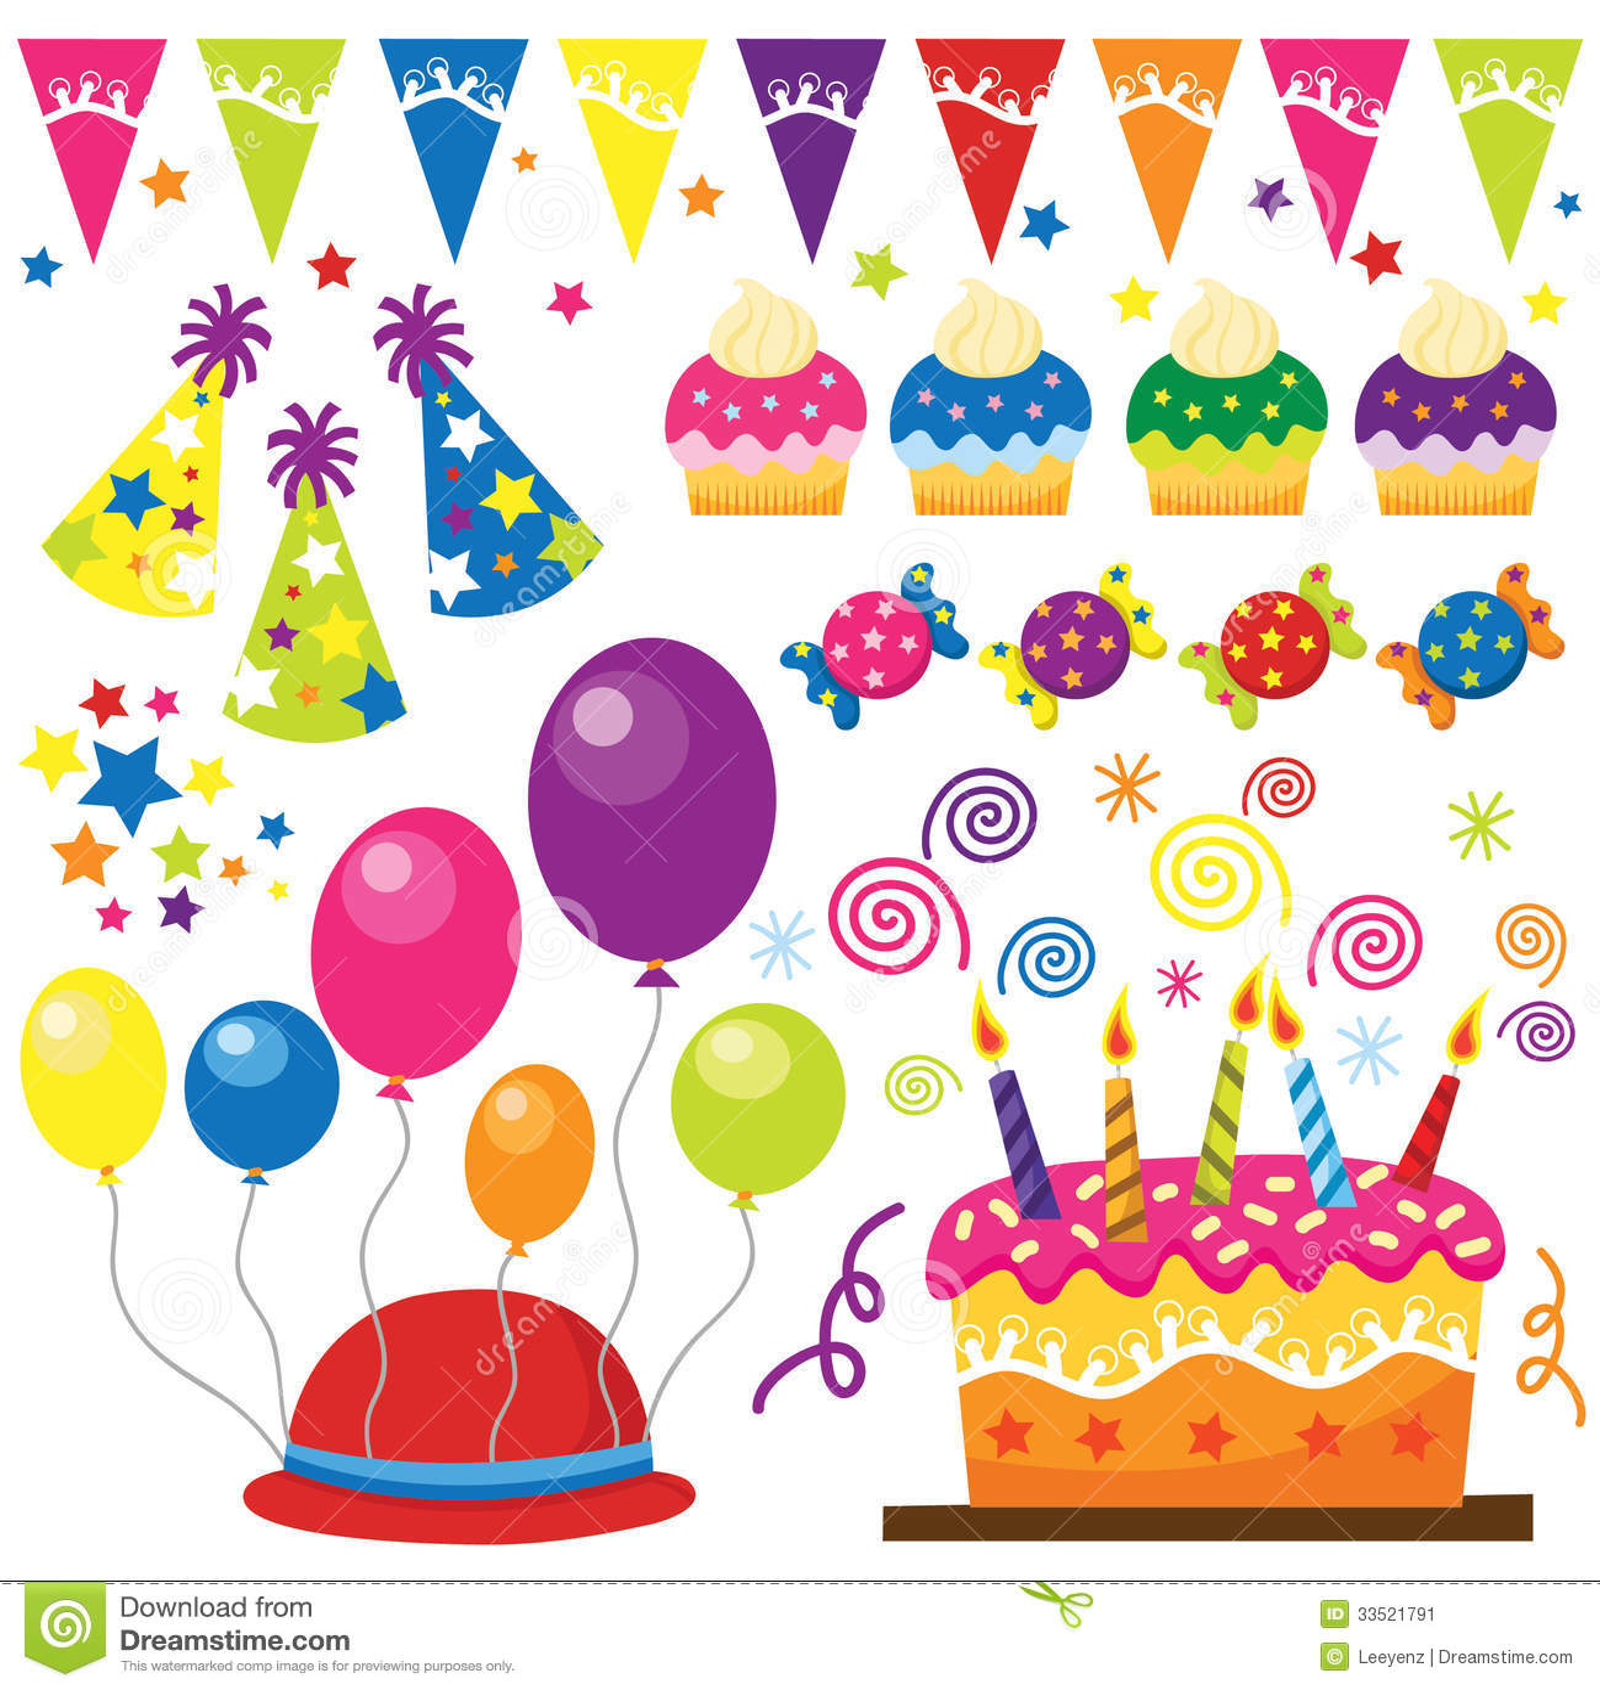 Disco Birthday Party Invitations Free for good invitations layout